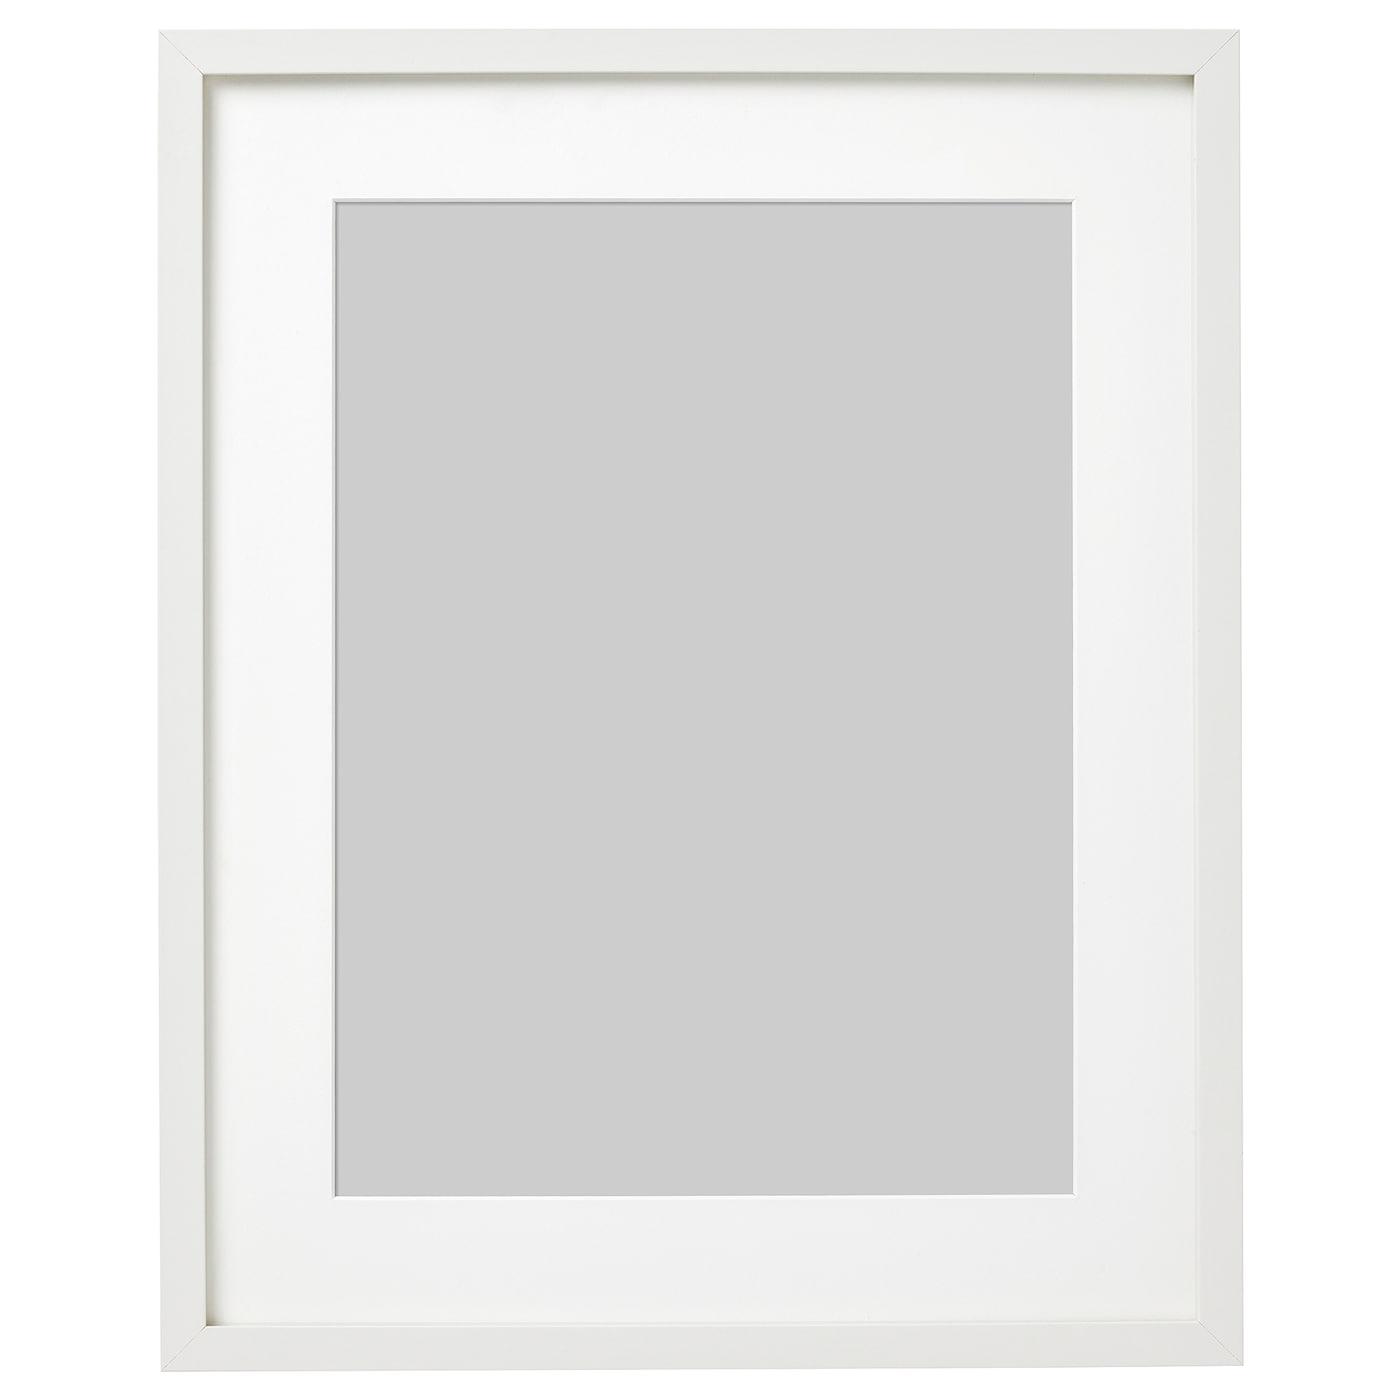 Ribba Frame White 16x20 Ikea